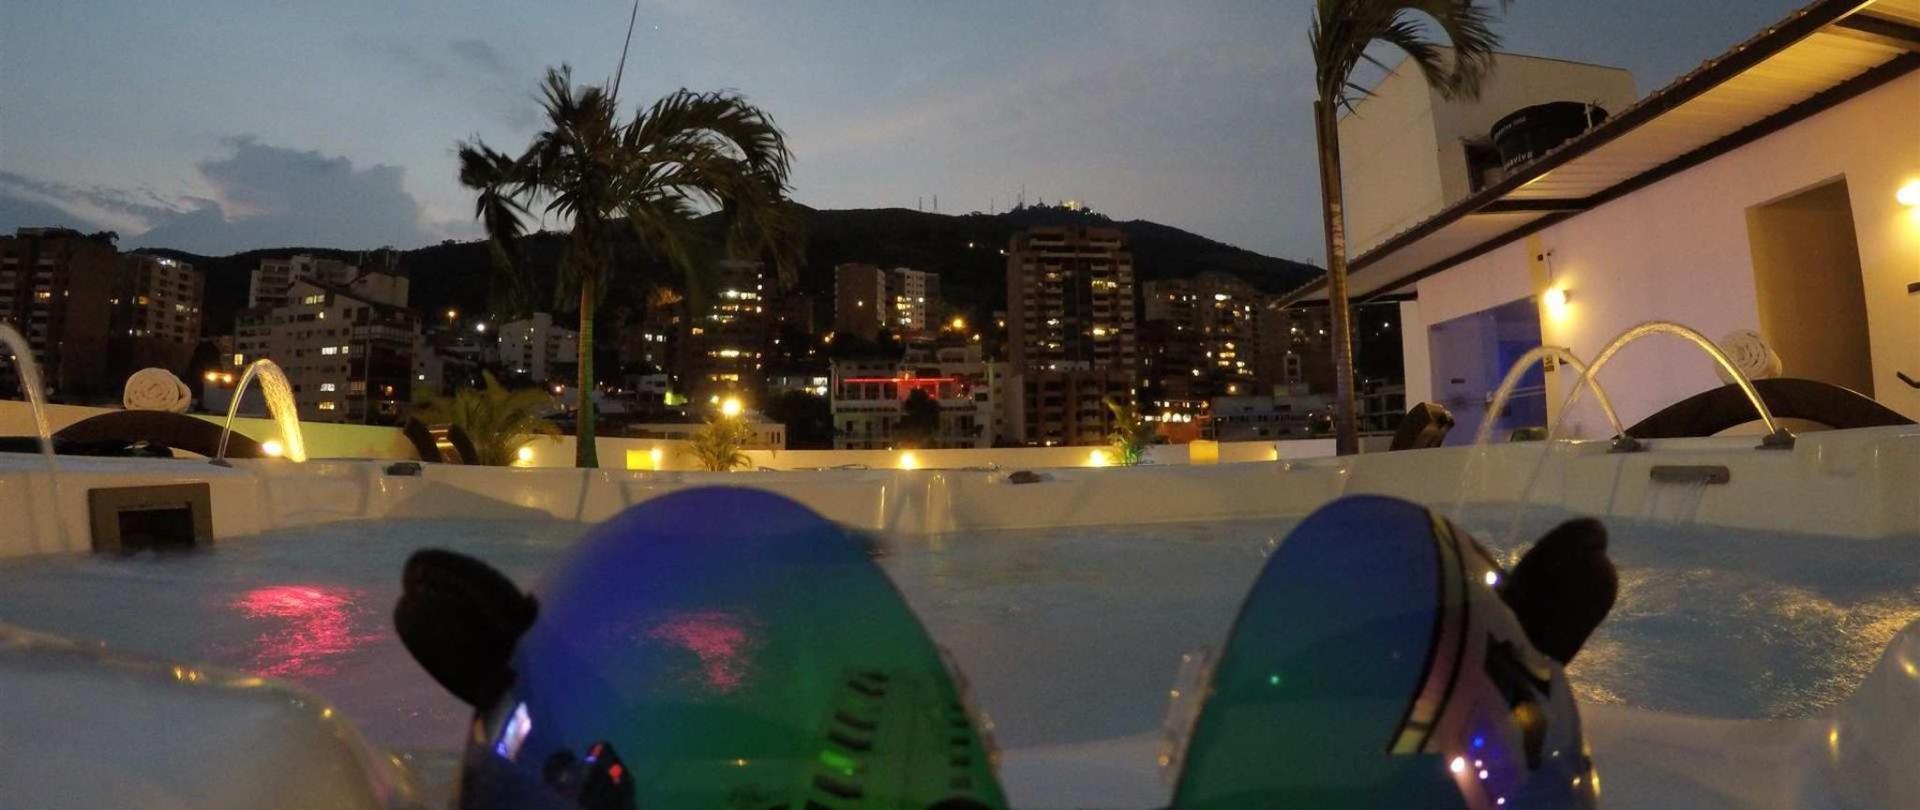 Hotel Aqua Granada